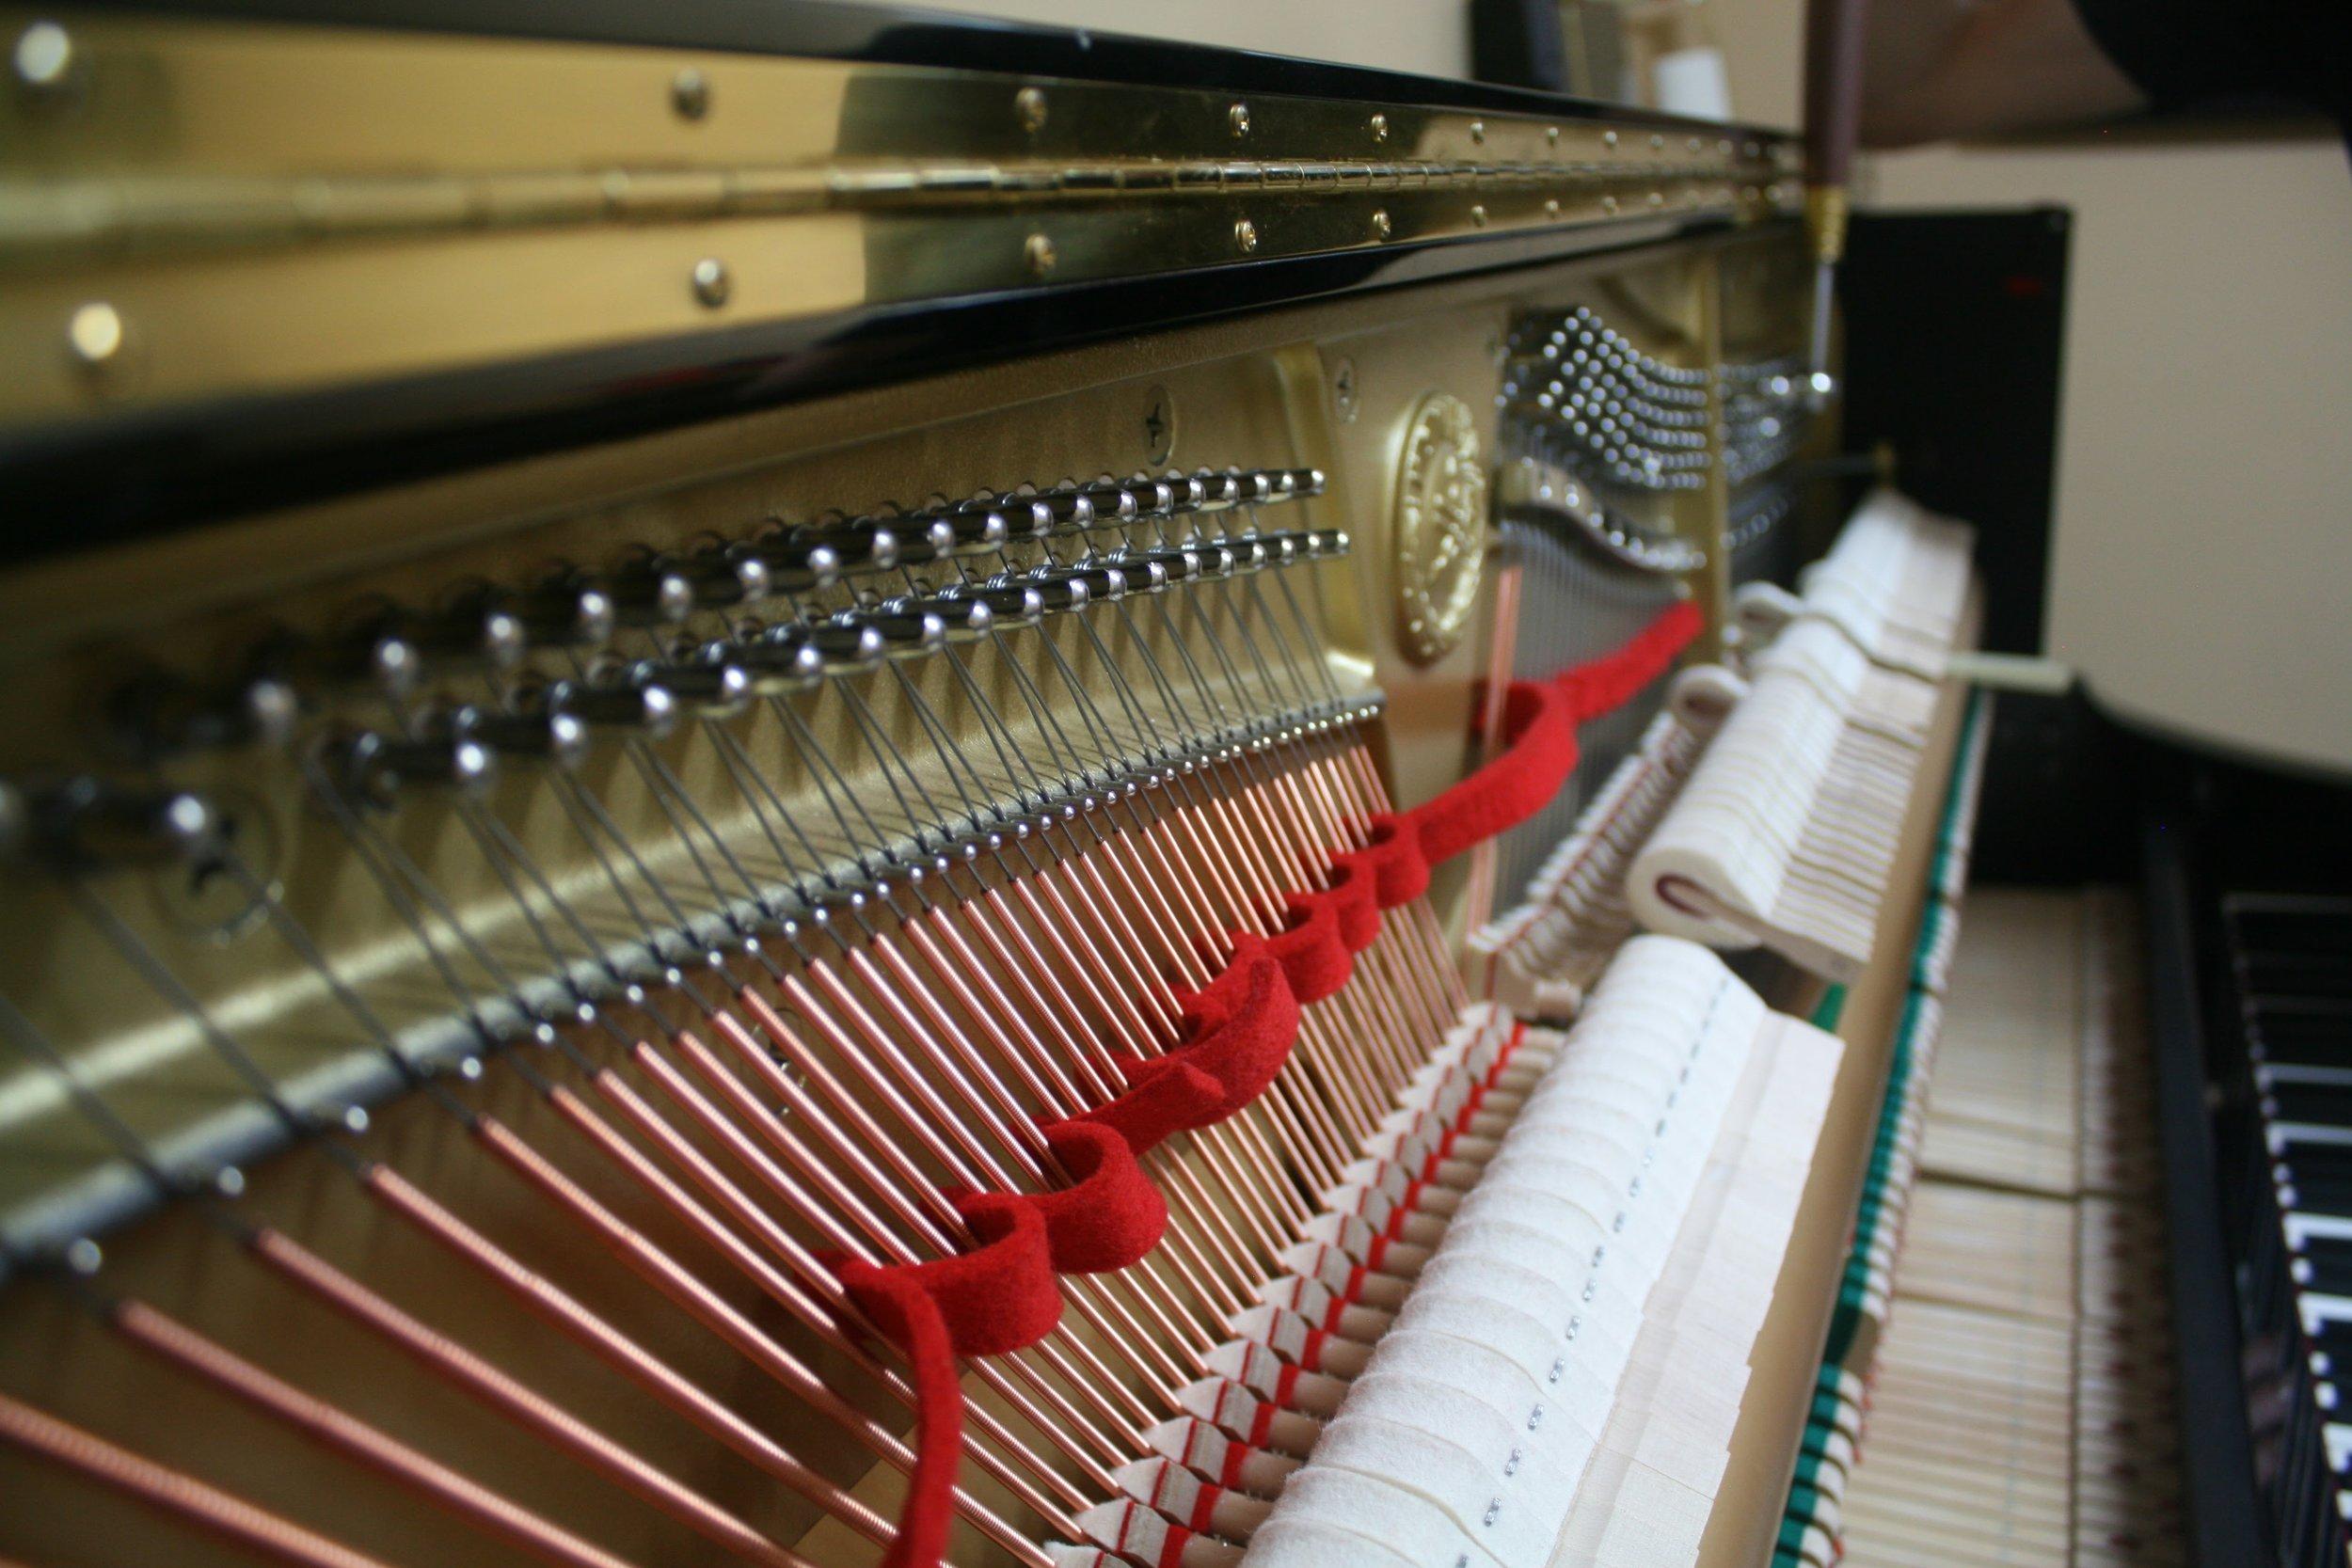 piano-tuning-tuner-sydney-north-shore-upright-grand.jpg